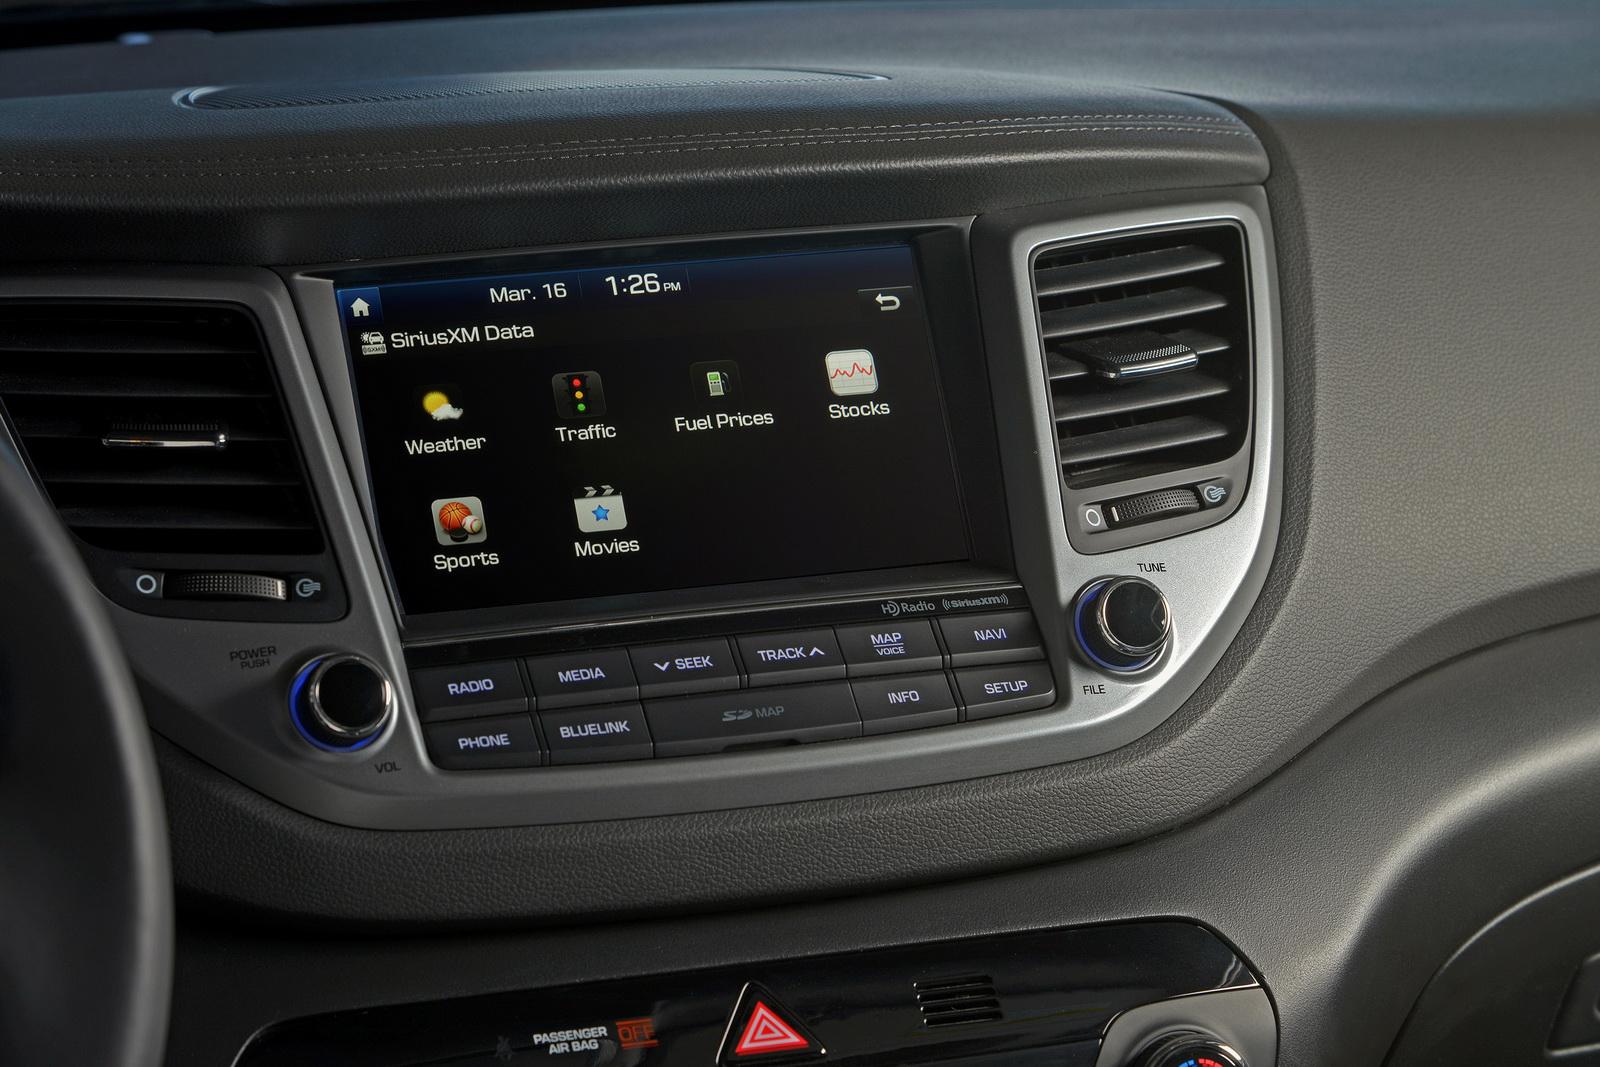 2016 Yeni Kasa Hyundai Tucson T 252 Rkiye Fiyatı A 231 ıklandı